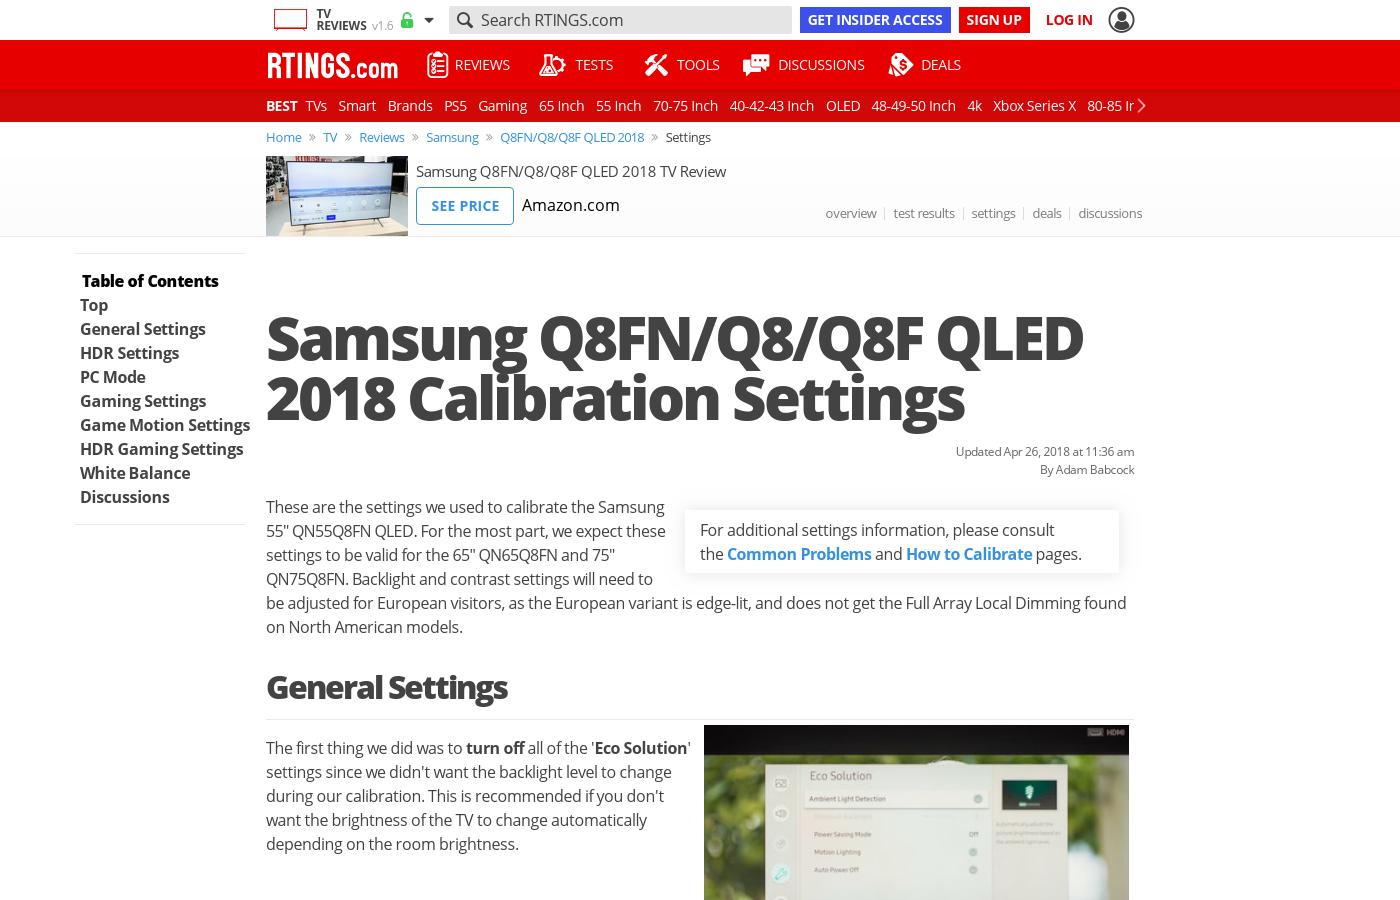 Samsung Q8FN/Q8/Q8F QLED 2018 Calibration Settings - RTINGS com